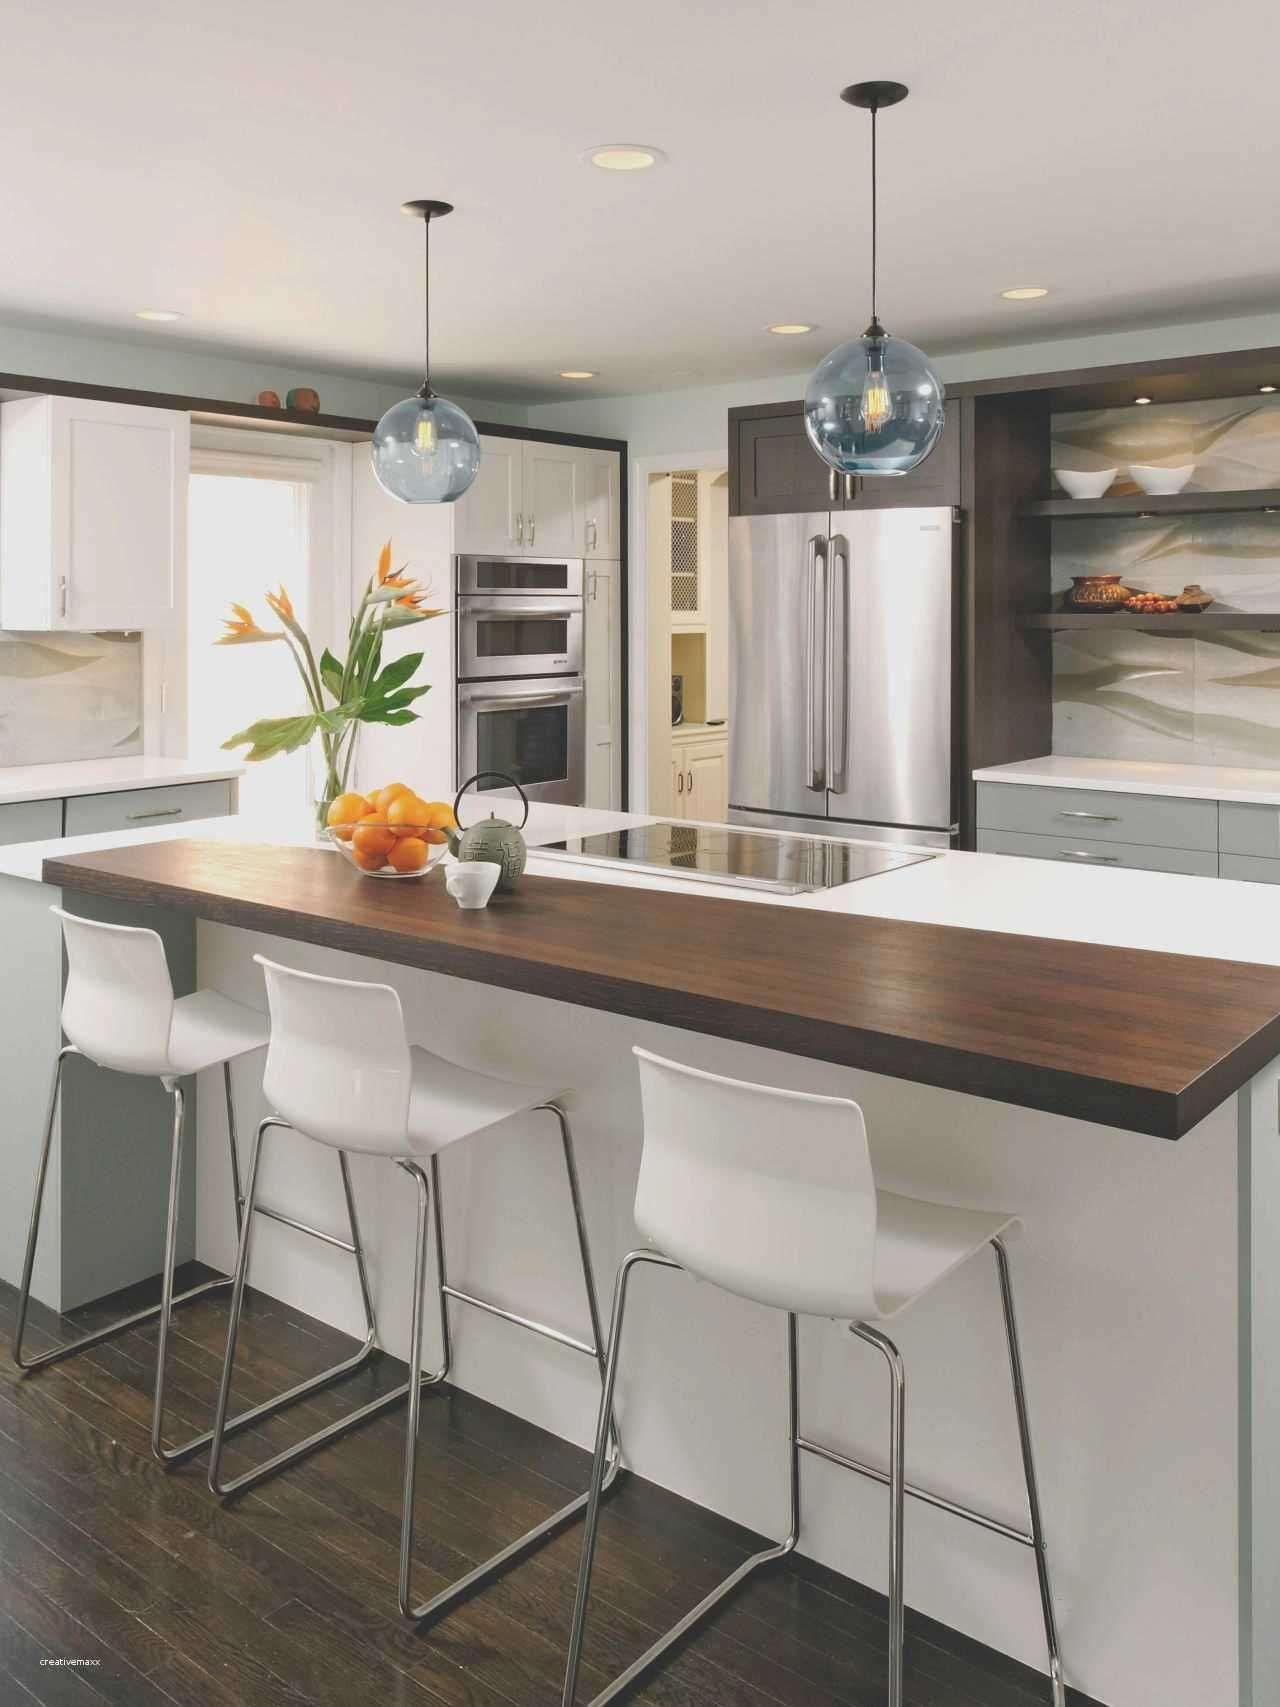 Kitchen Ideas With Island Pinterest   Brainly